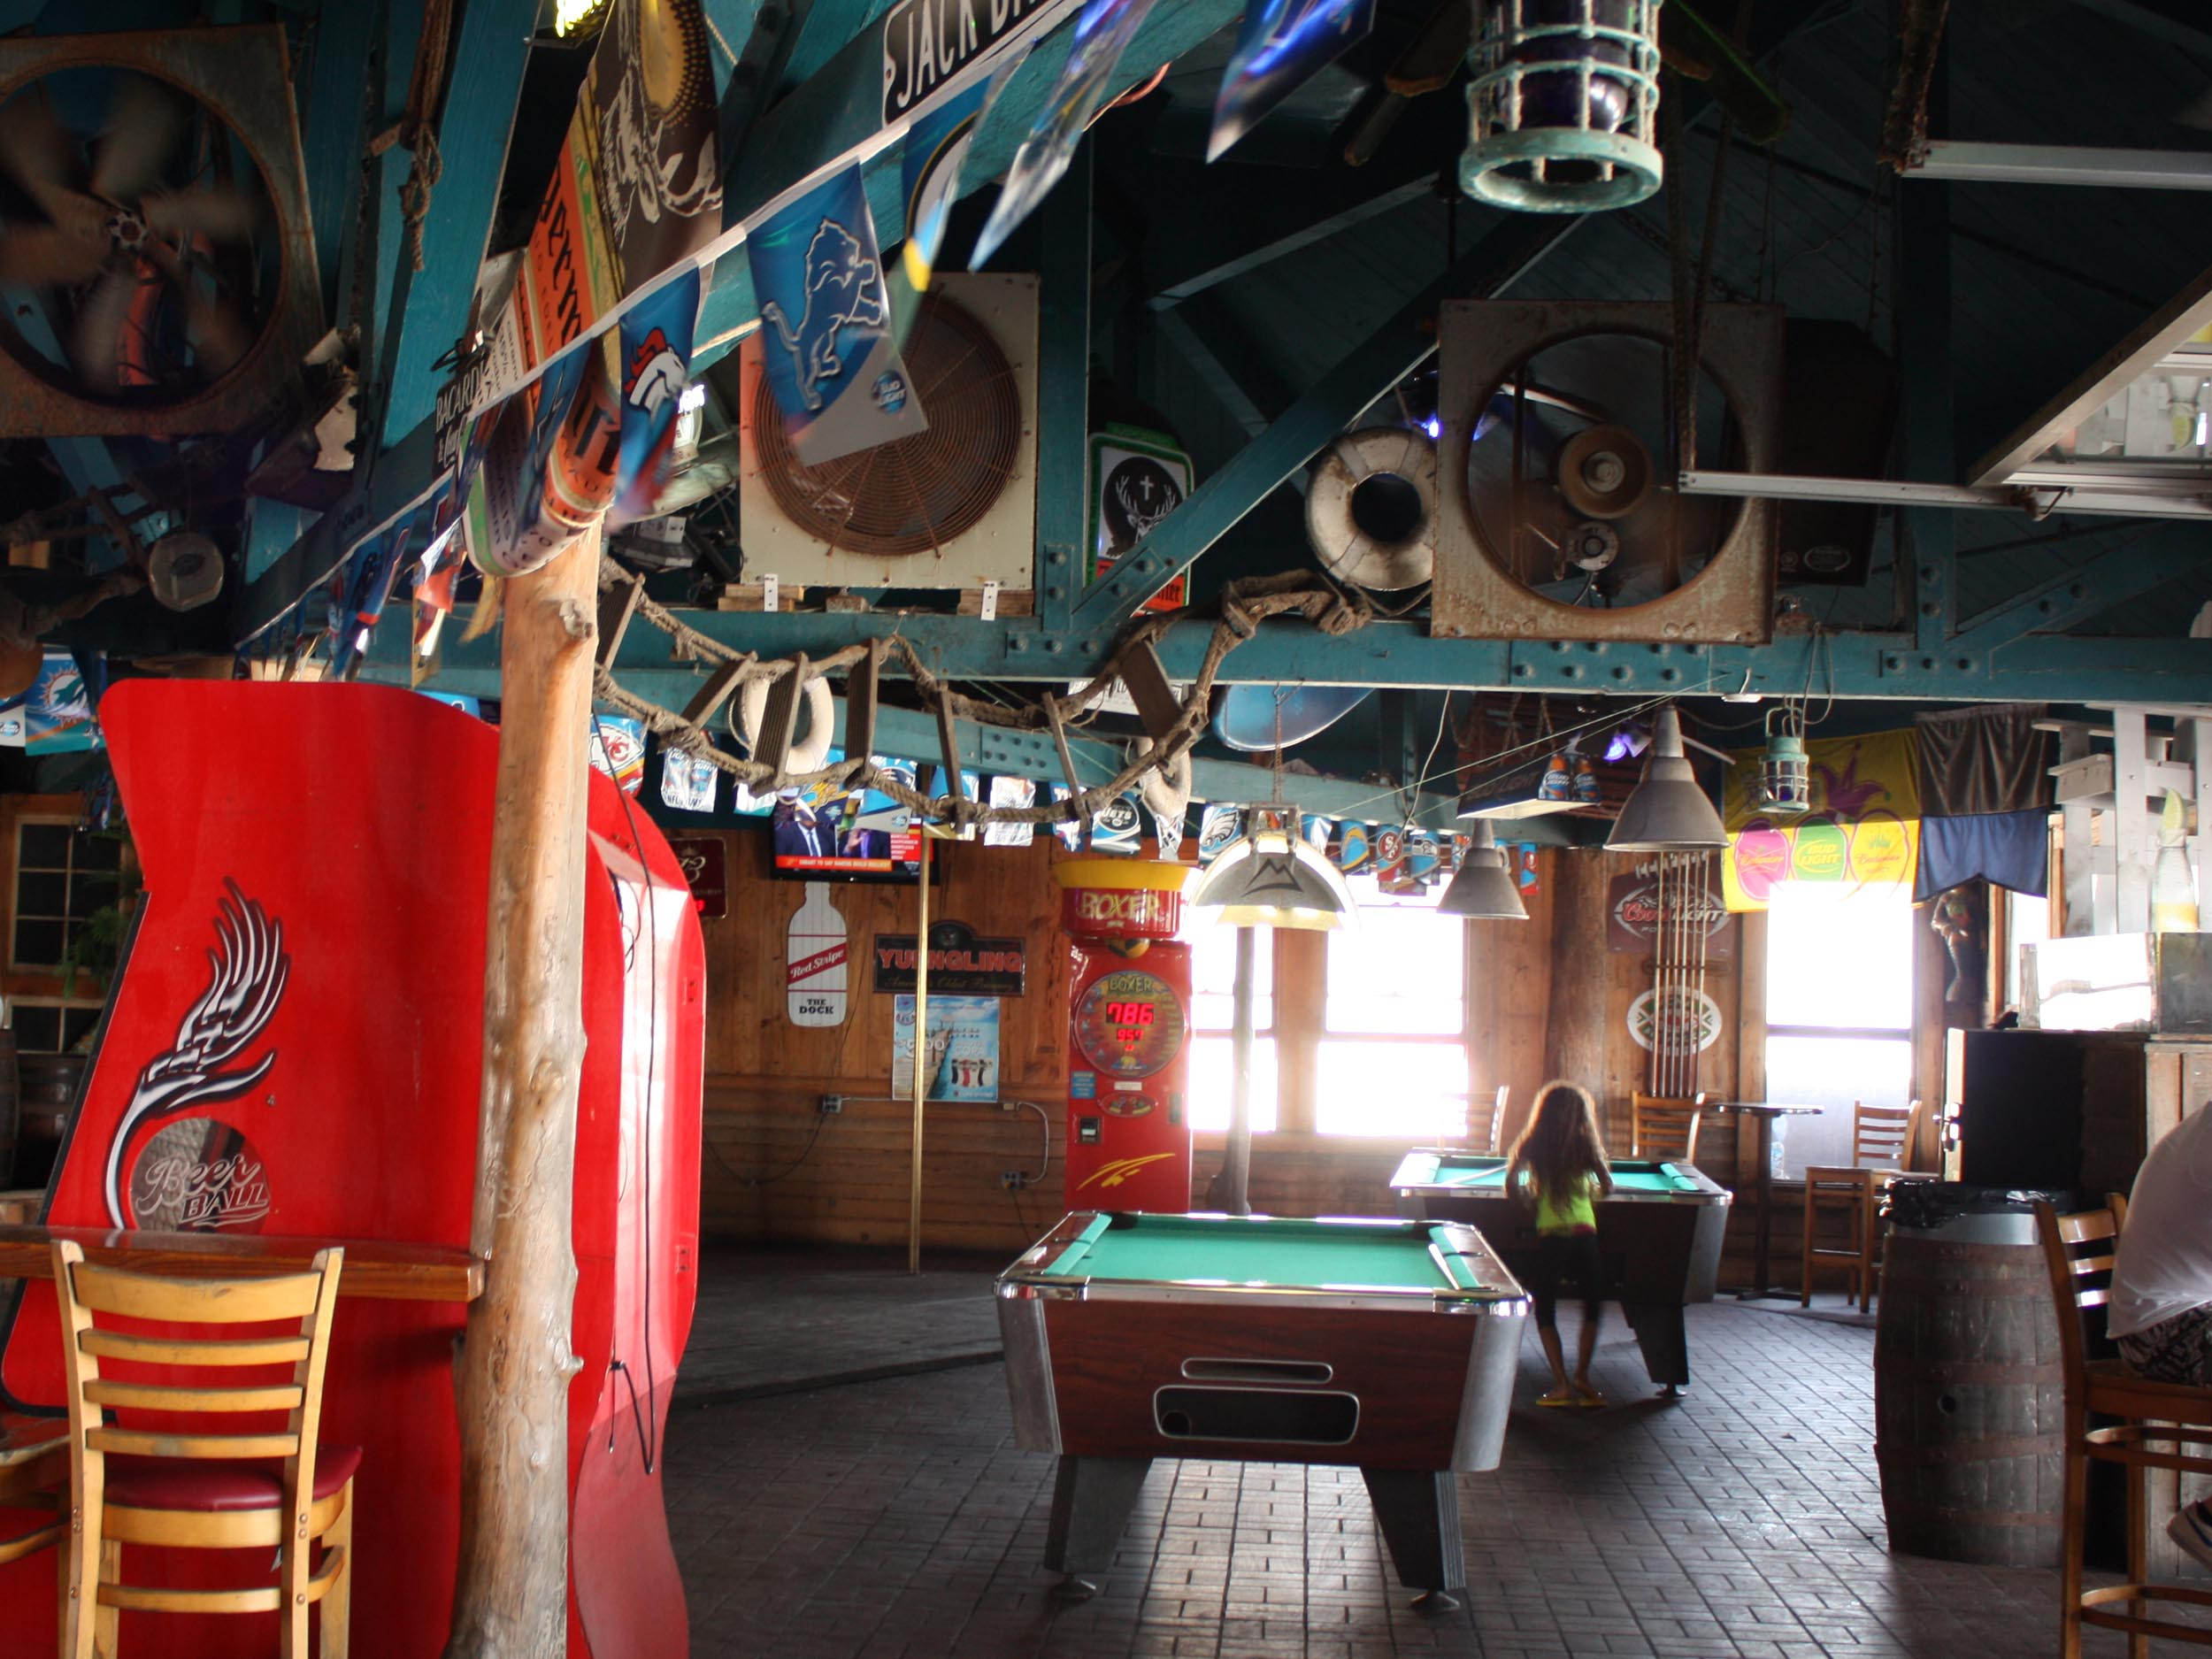 The Dock Interior